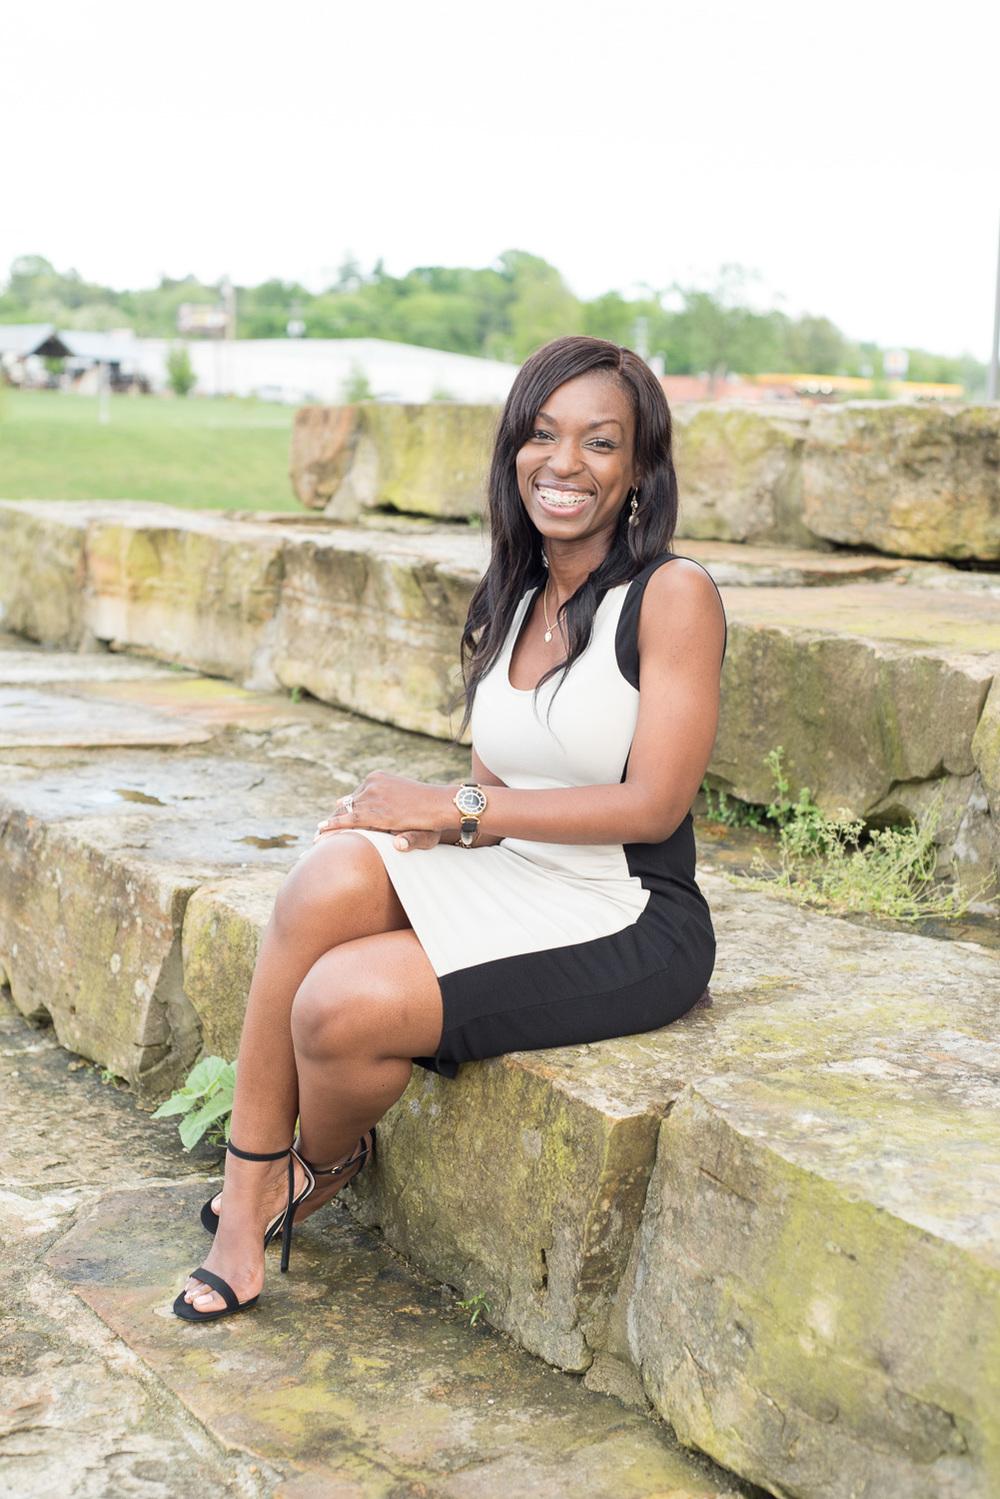 Small business headshot photos in Clarksville, TN // dphillipsphotography.com